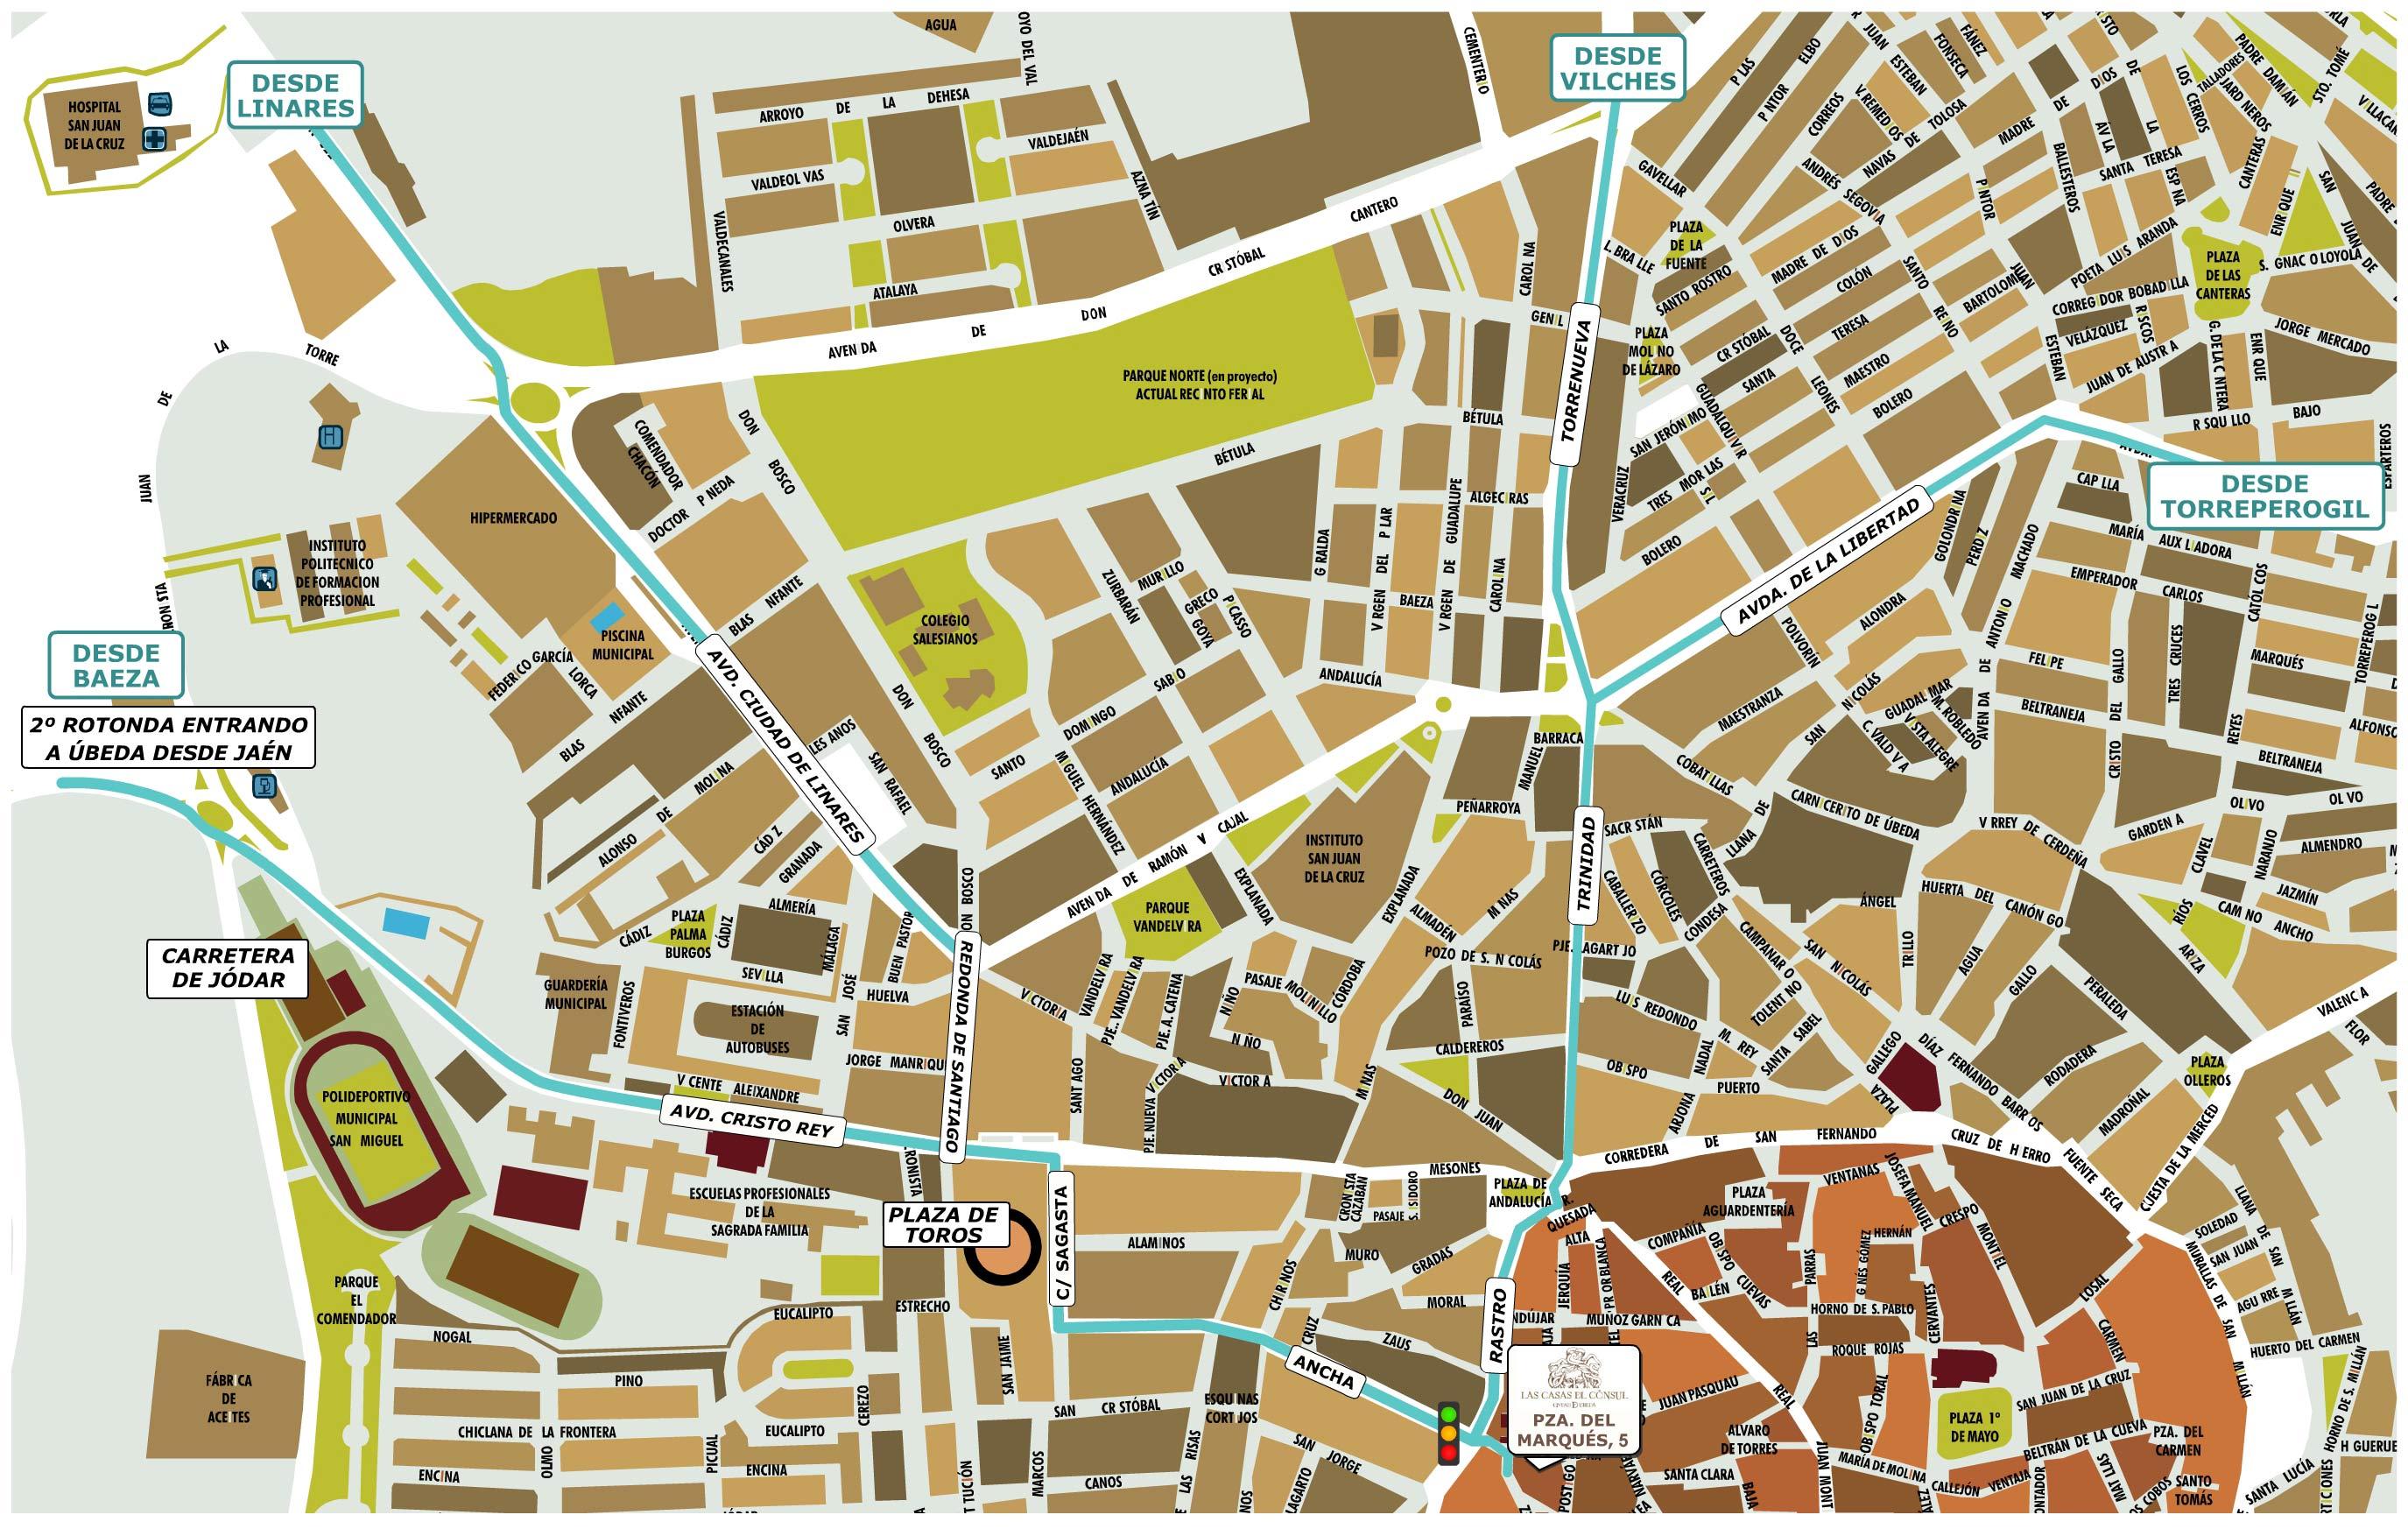 Imagen de Linares mapa 23700 3